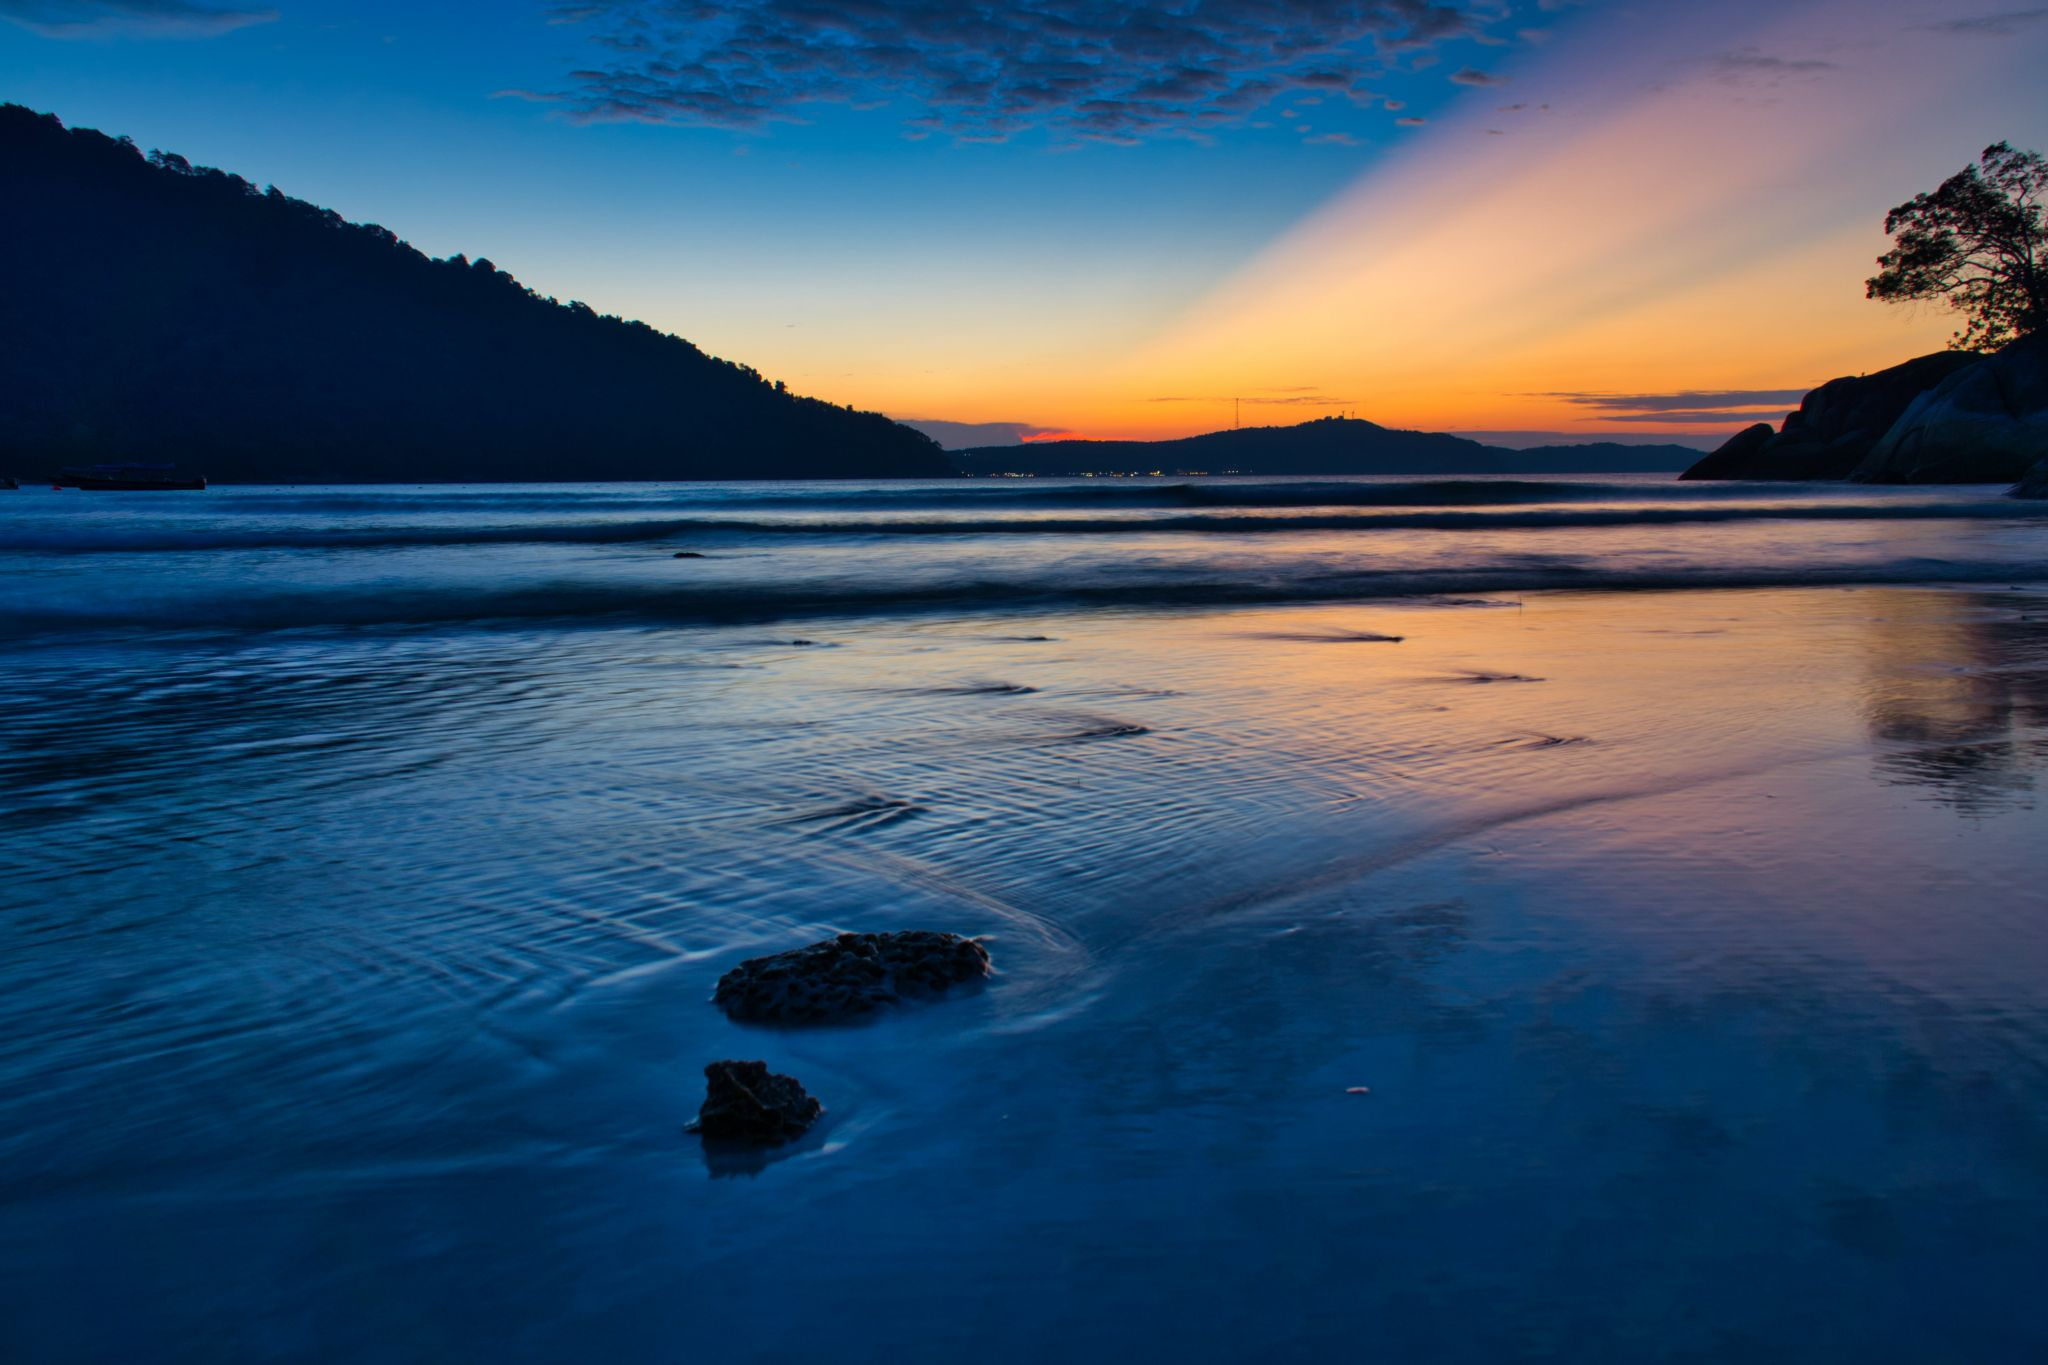 Sunset at Perhentian Islands, Malaysia